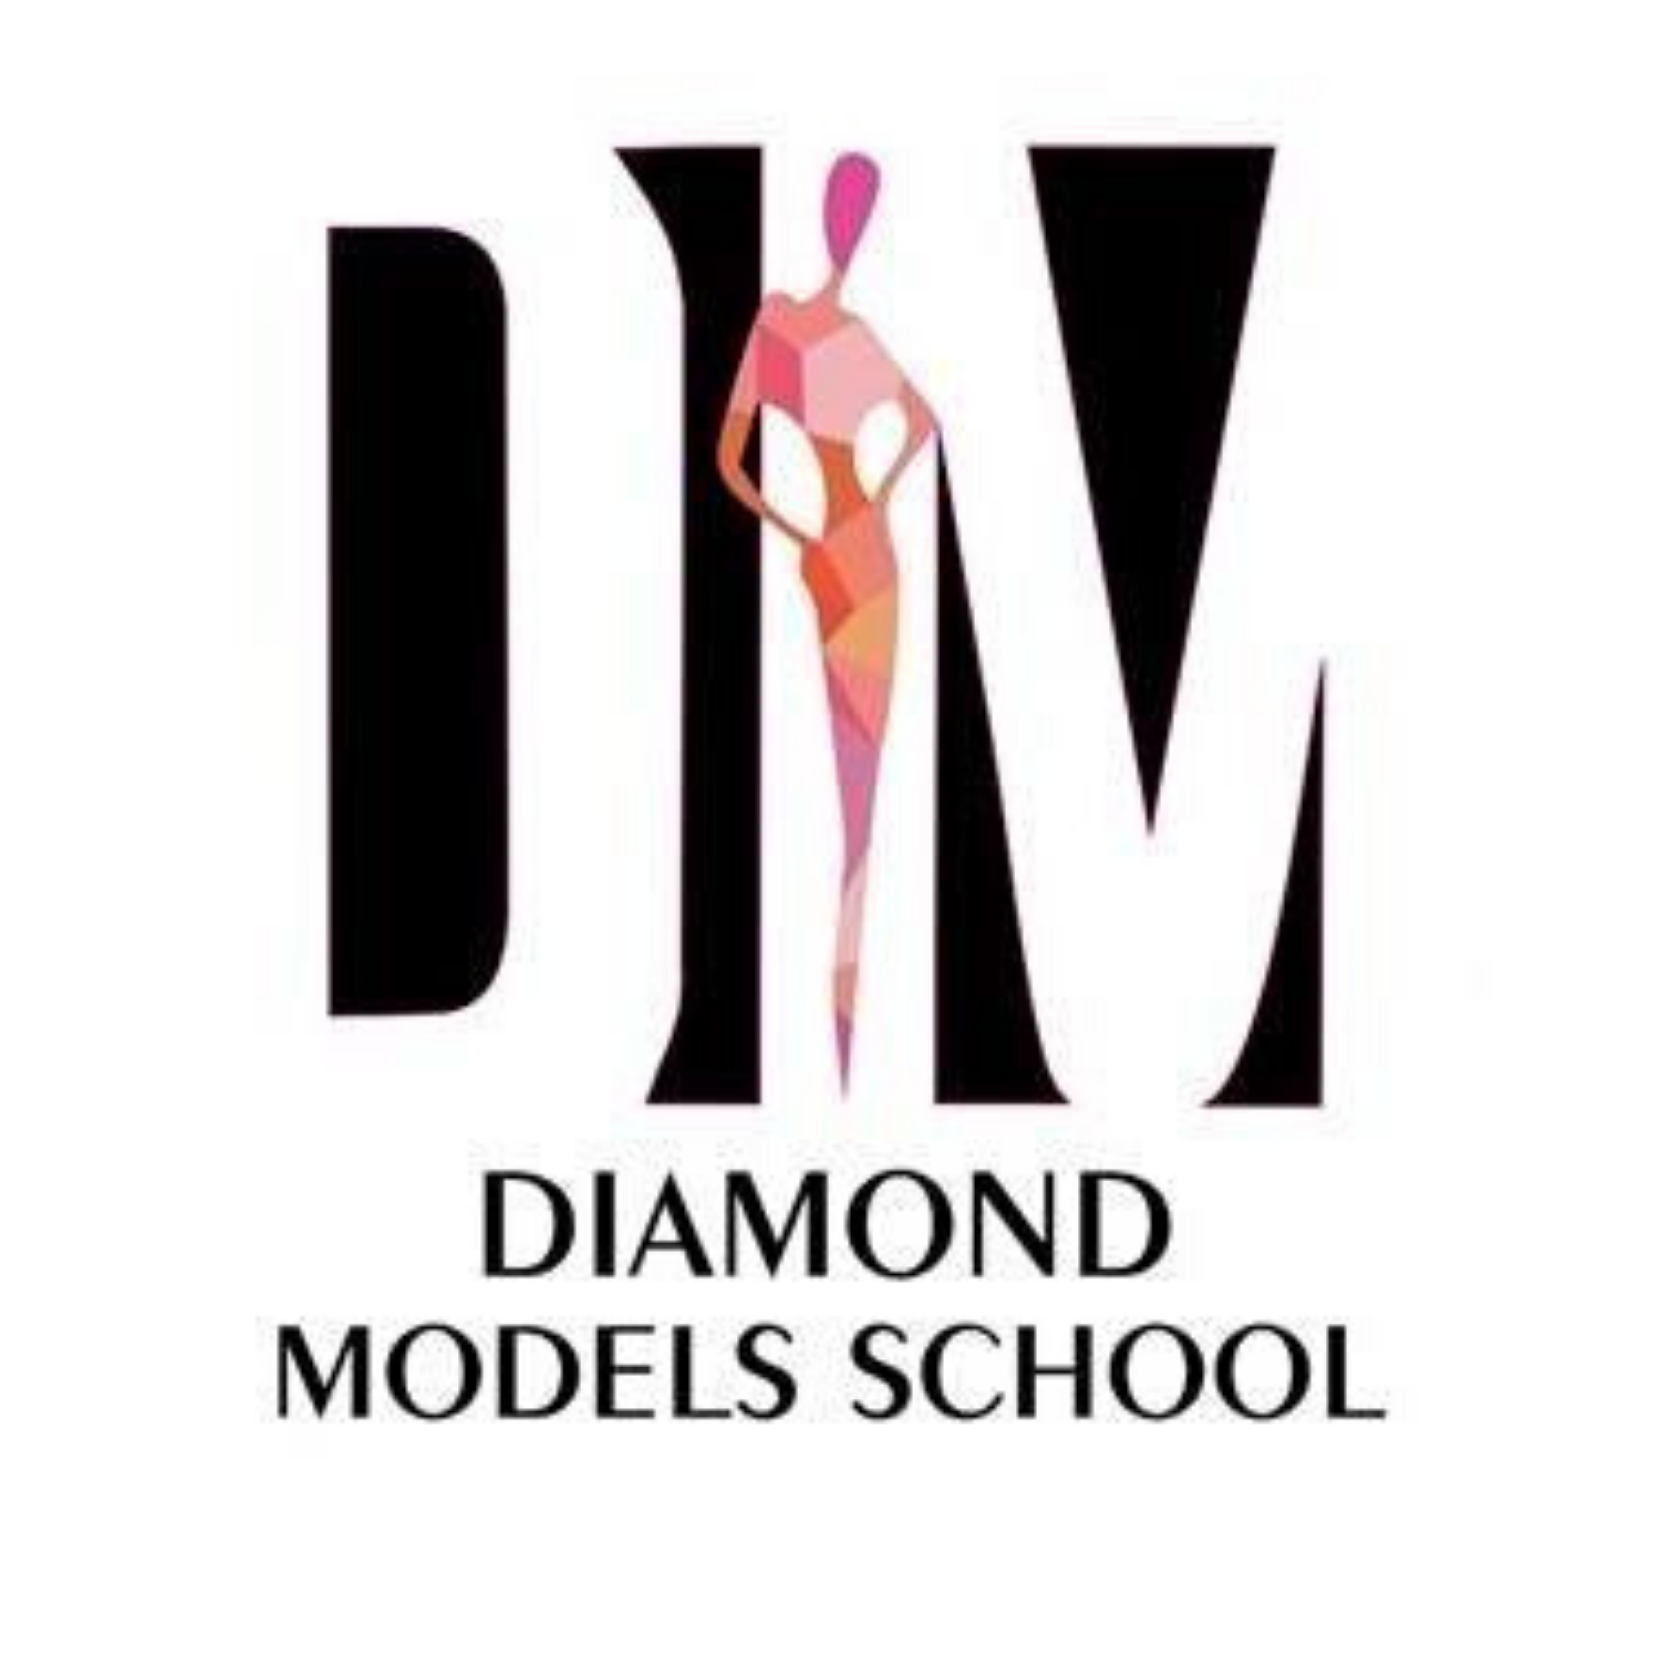 https://dfashionmagazine.com/Diamond Models School